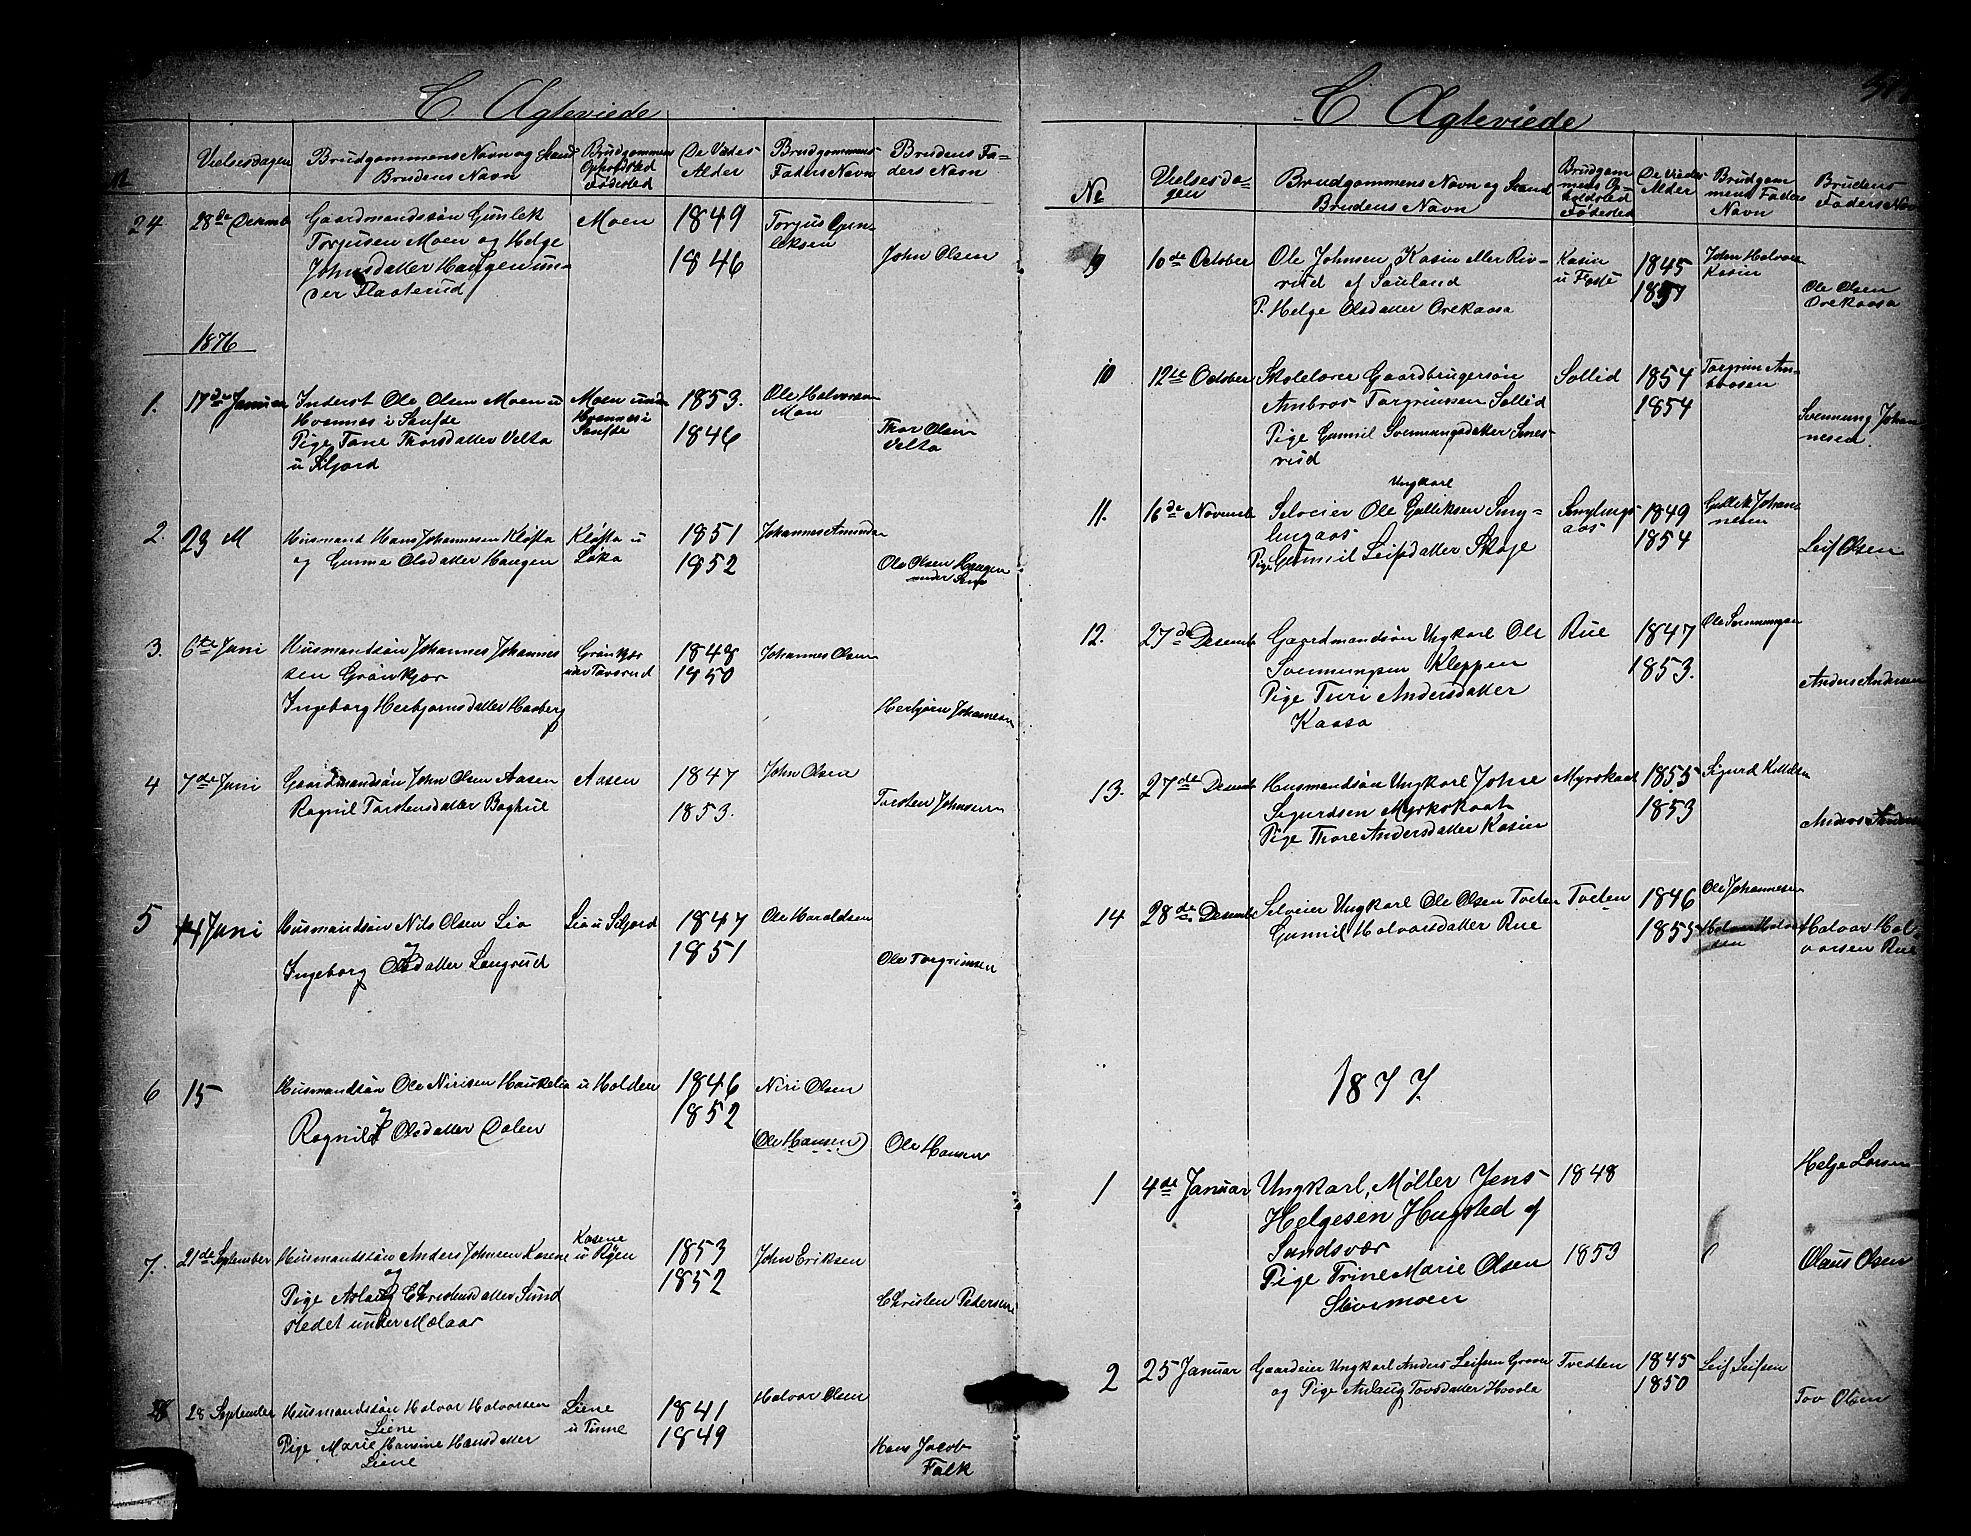 SAKO, Heddal kirkebøker, G/Ga/L0001: Klokkerbok nr. I 1, 1866-1878, s. 316-317